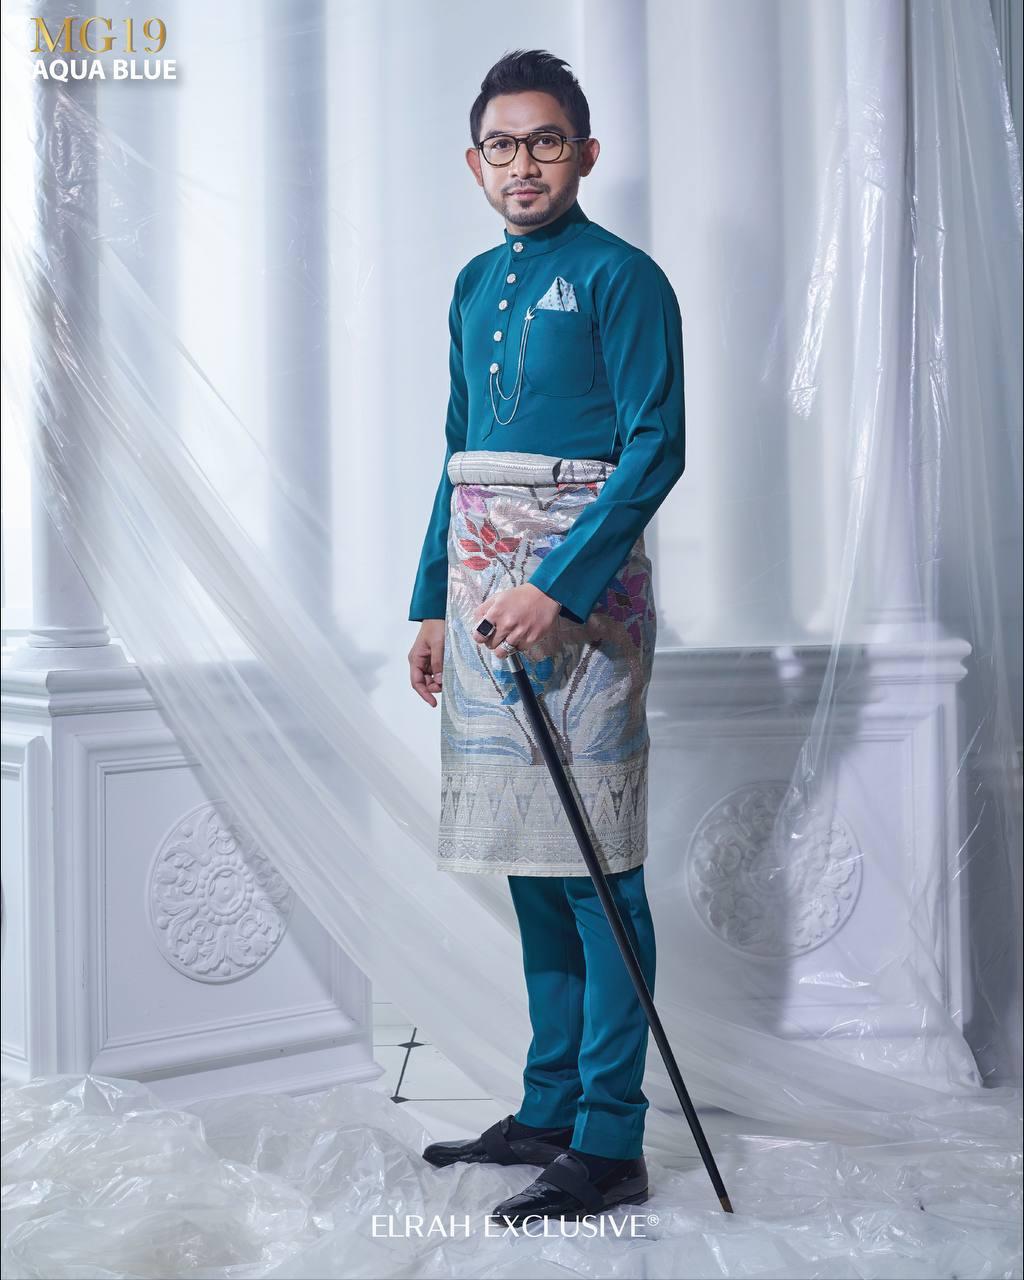 BAJU MELAYU MAGNIFICENT AQUA BLUE (FREE SAMPIN)